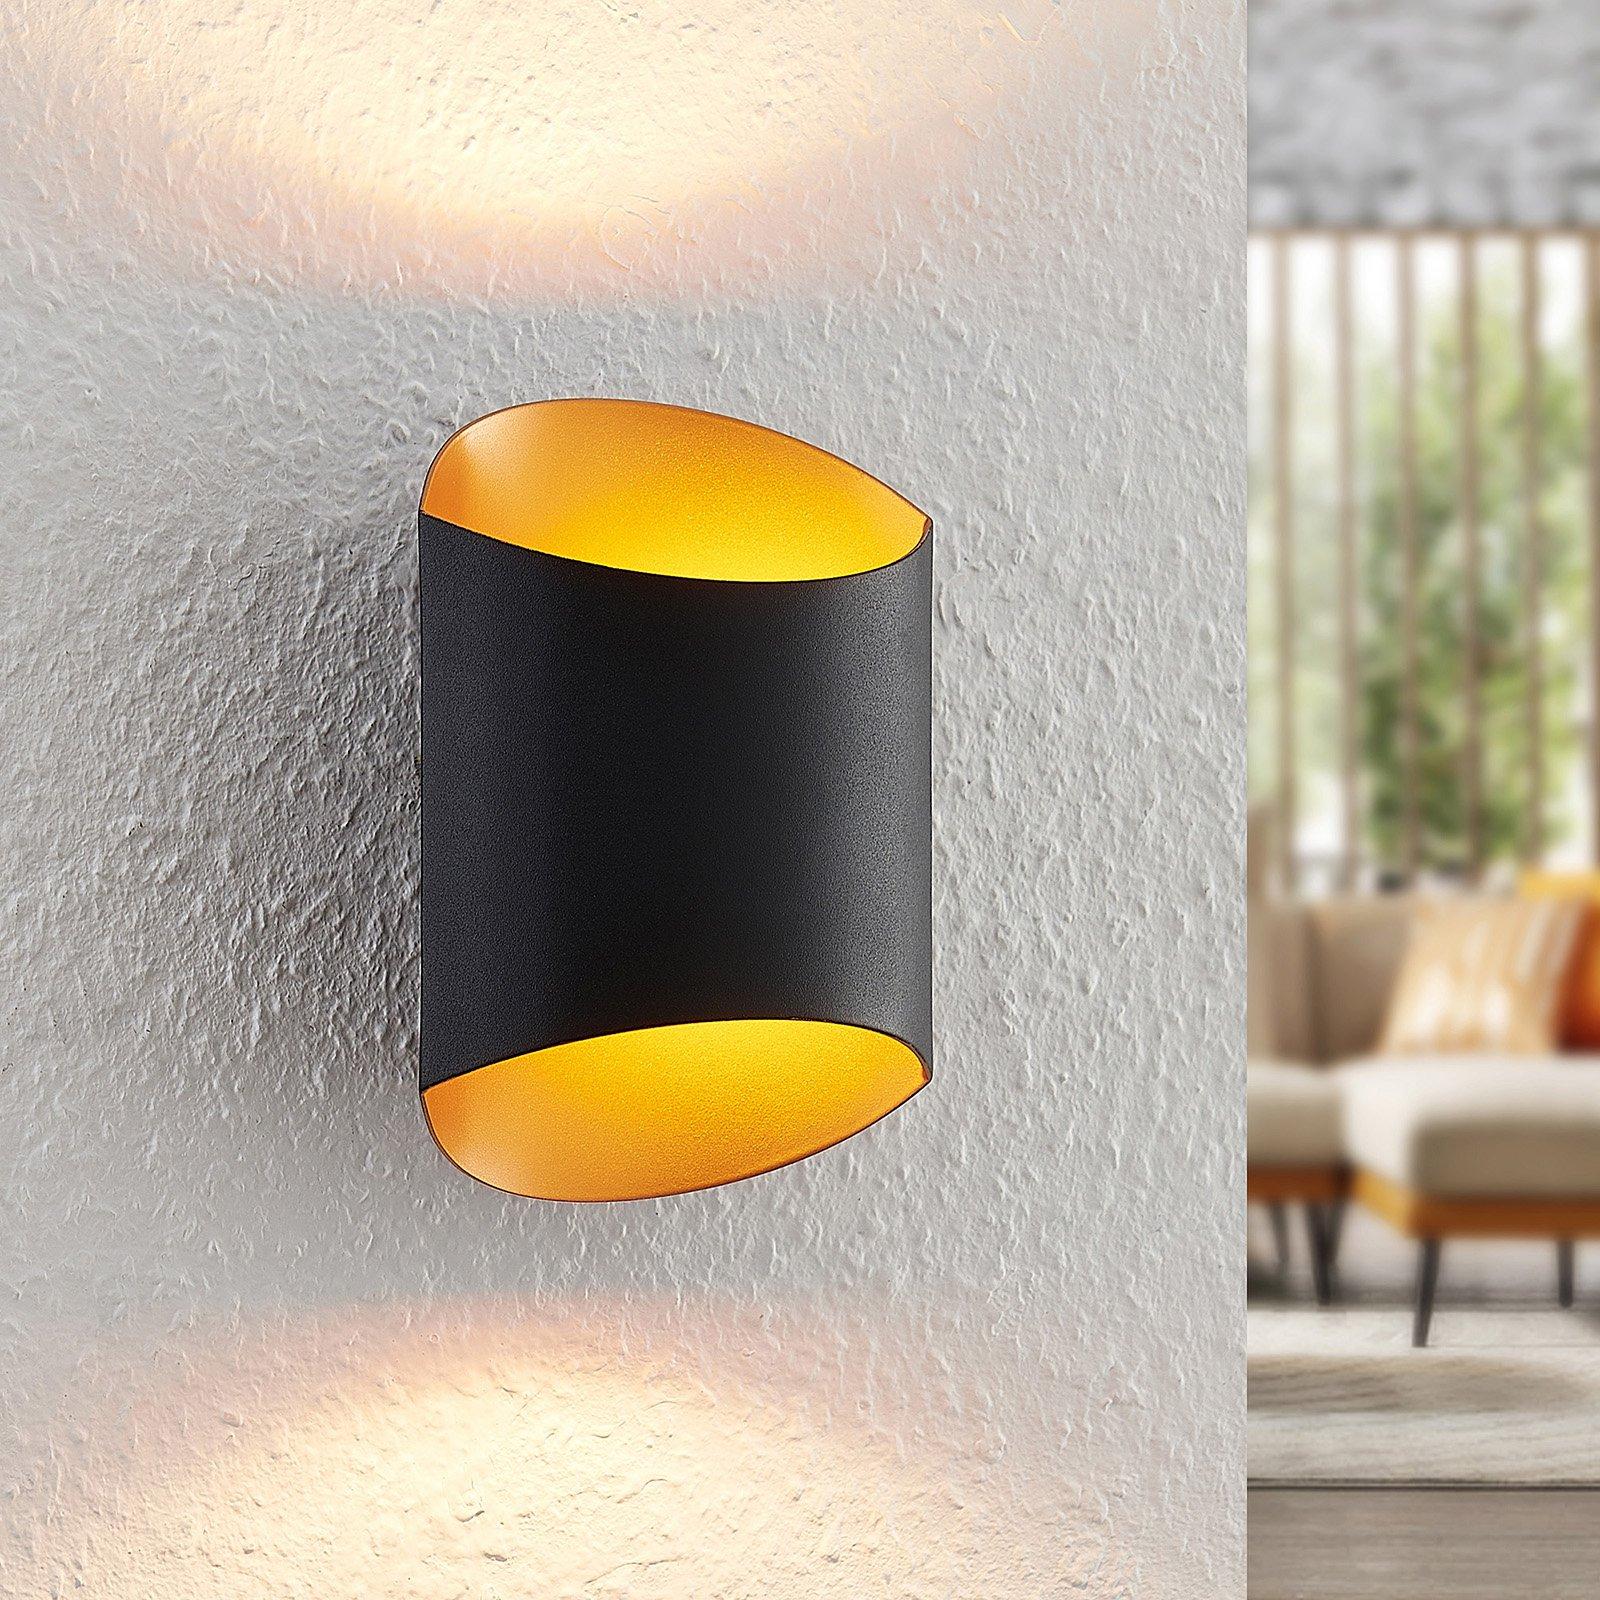 Arcchio Ayaz LED-vegglampe, svart og gull